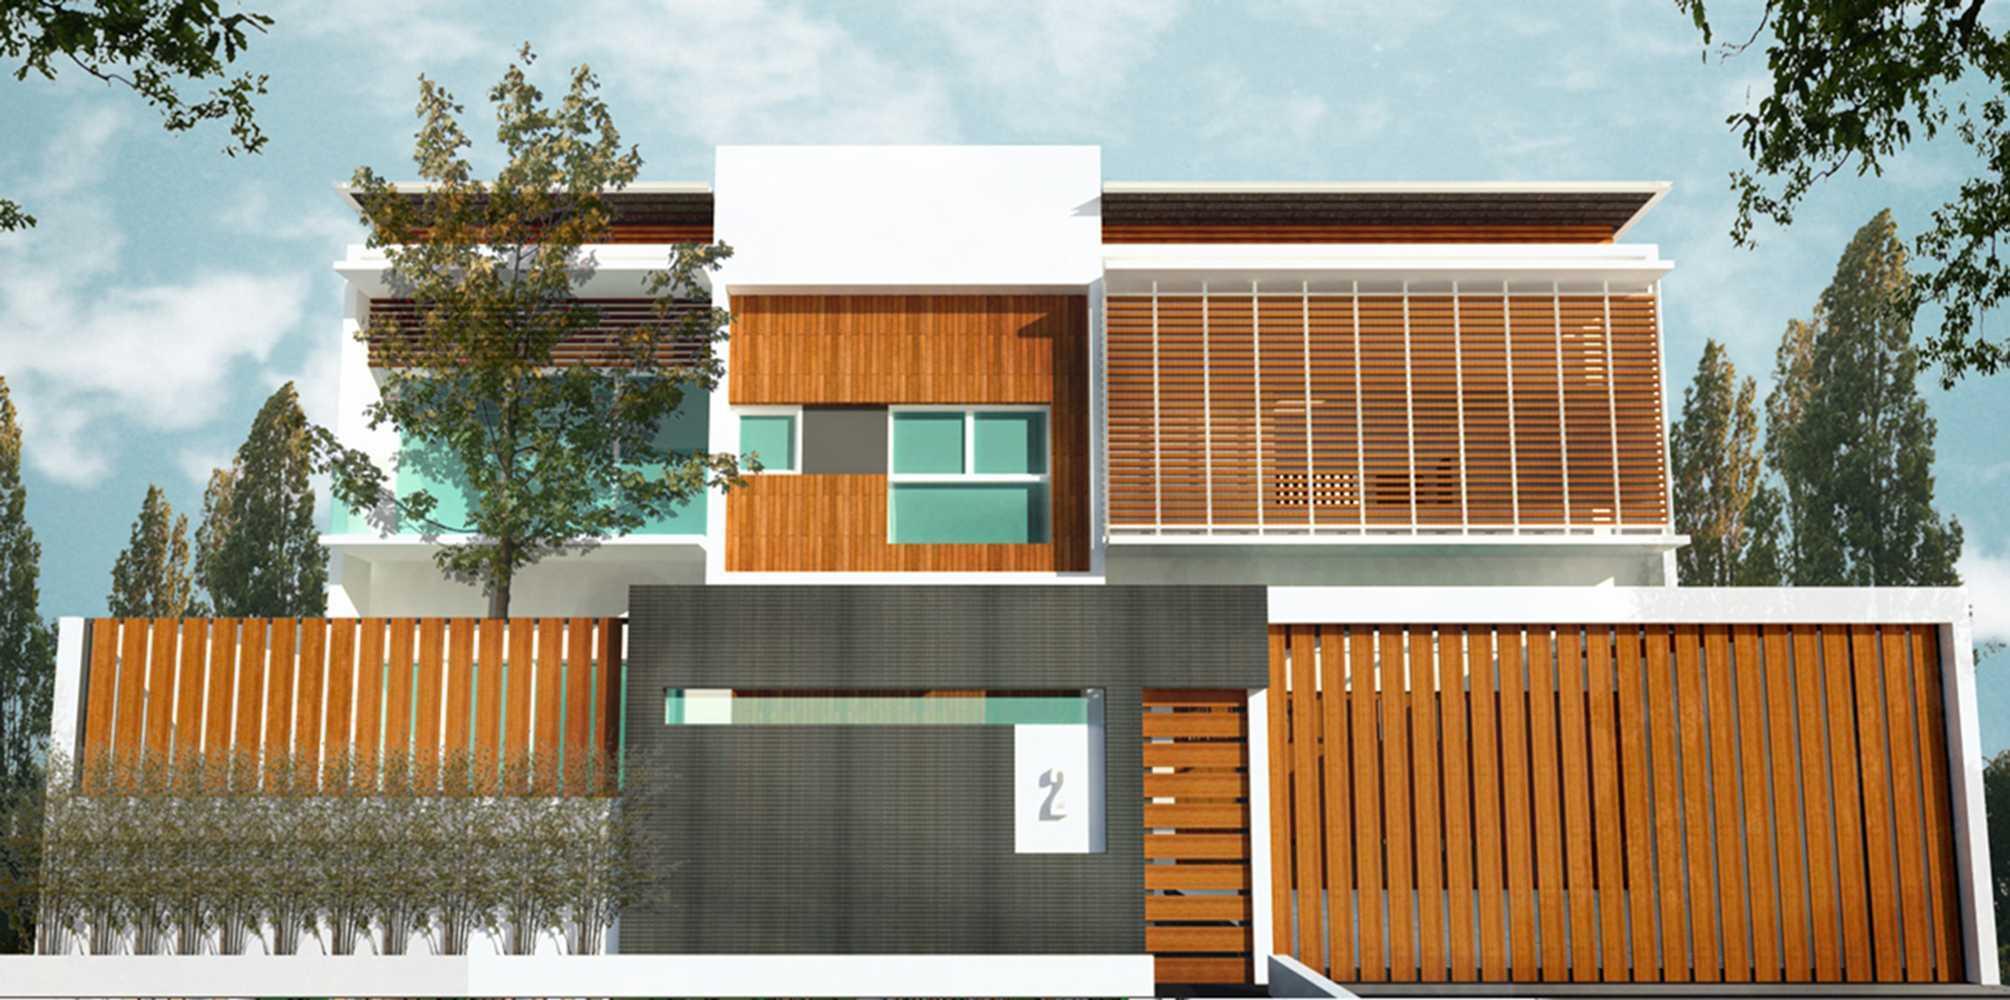 Ashari Architects Kalibata House Jakarta, Indonesia Jakarta, Indonesia Render-Front-View Kontemporer  11863